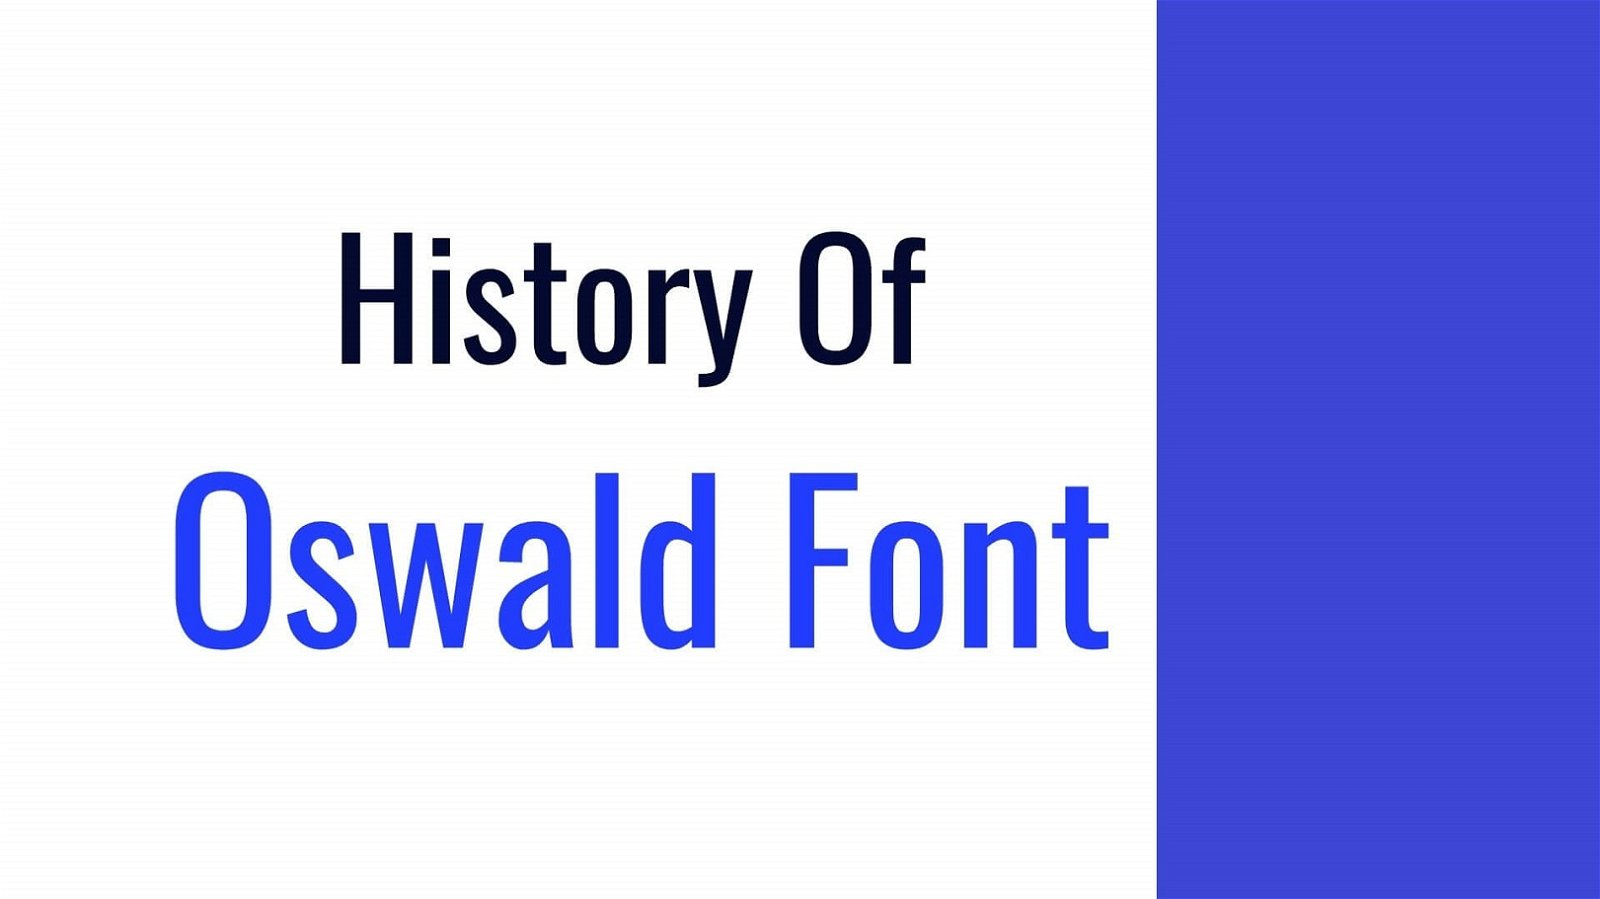 History of Oswald Font